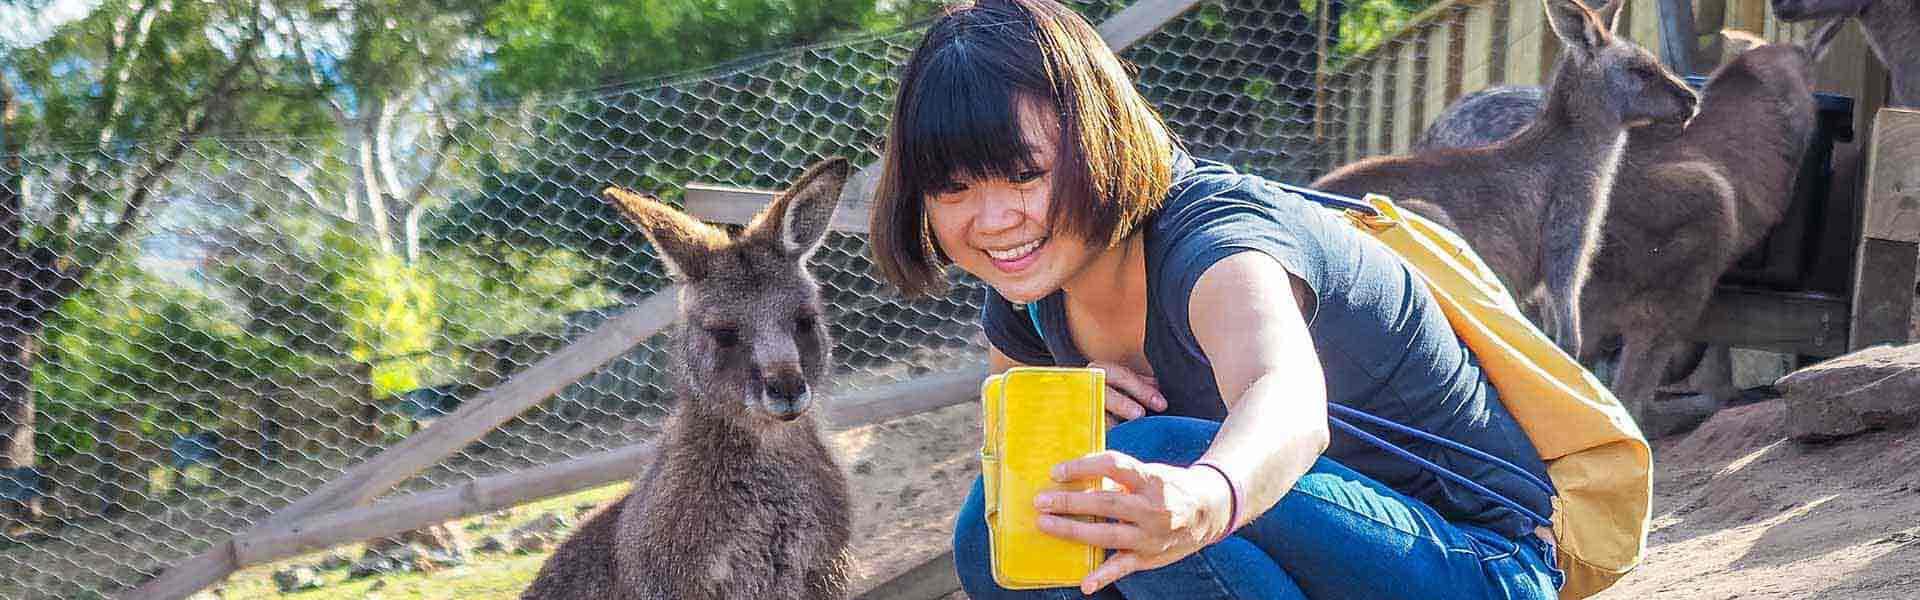 2019 Educatius High School Programs in Australia for International Students